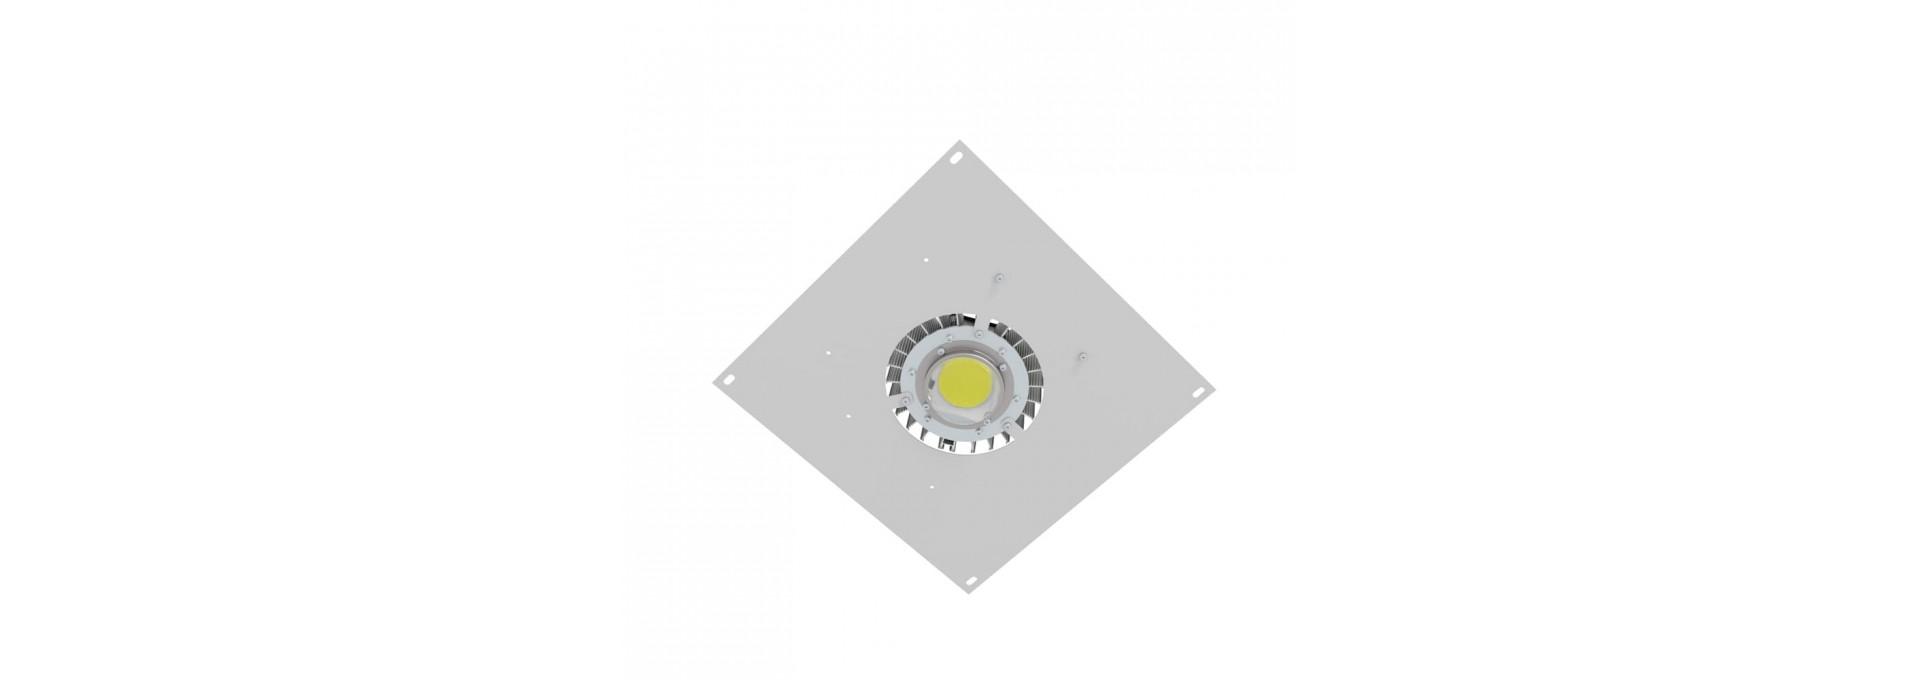 АЗС 50 Эко 6500К 60°